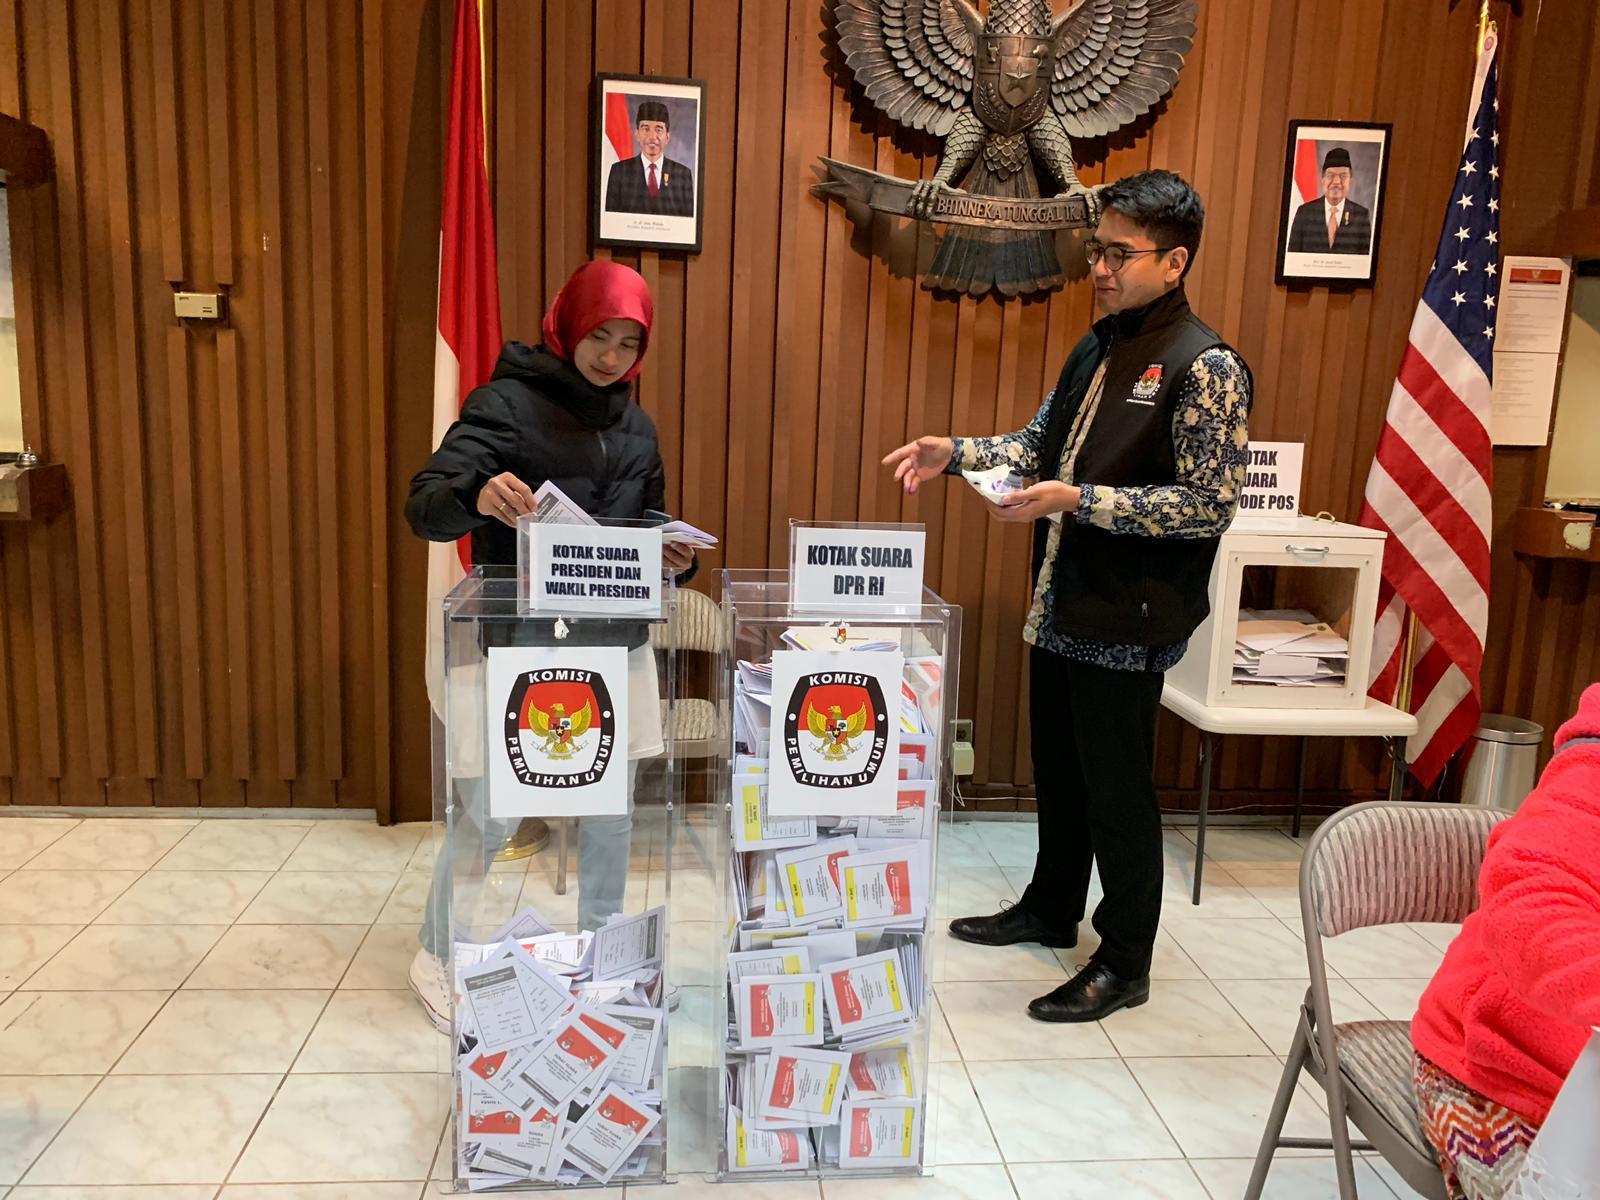 warga indonesia san francisco gunakan hak pilih di pemilu 2019